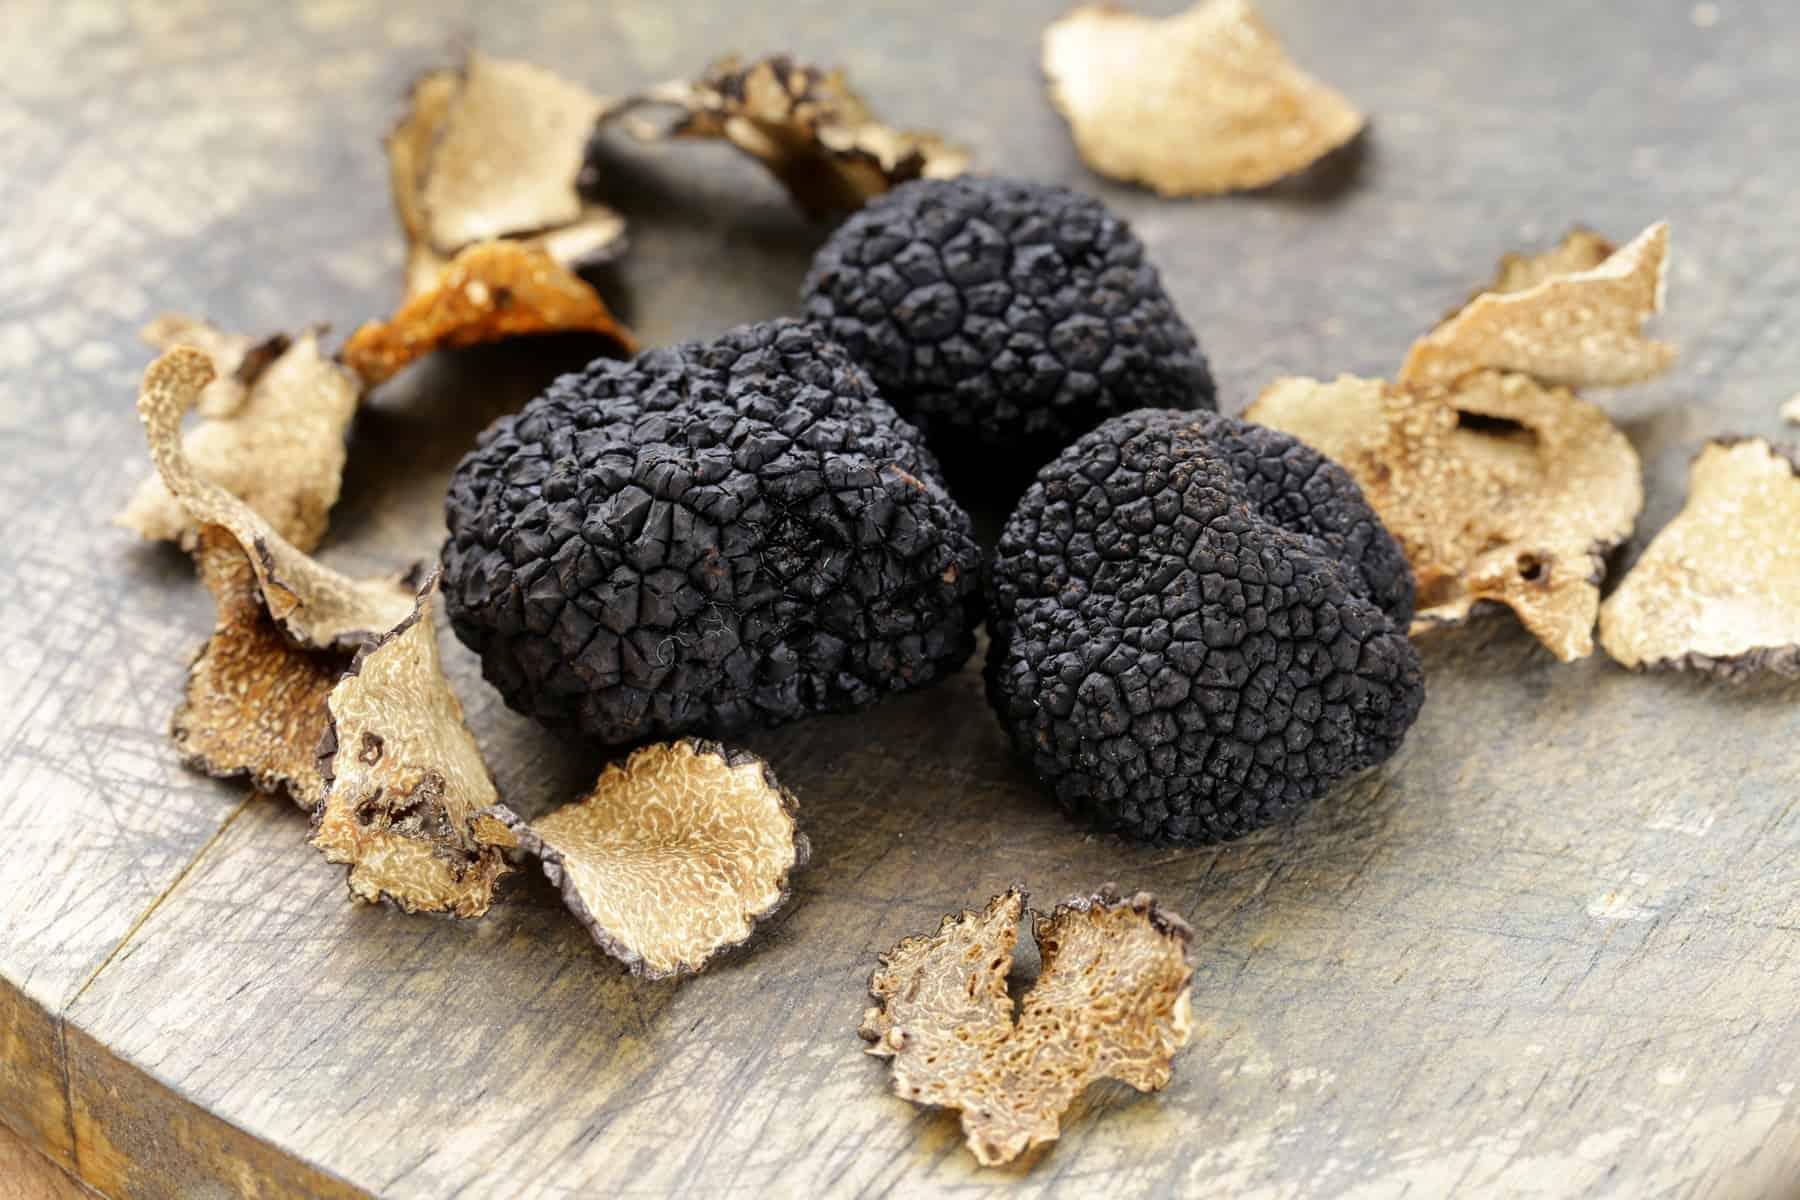 Expensive rare black truffle mushroom - gourmet vegetable